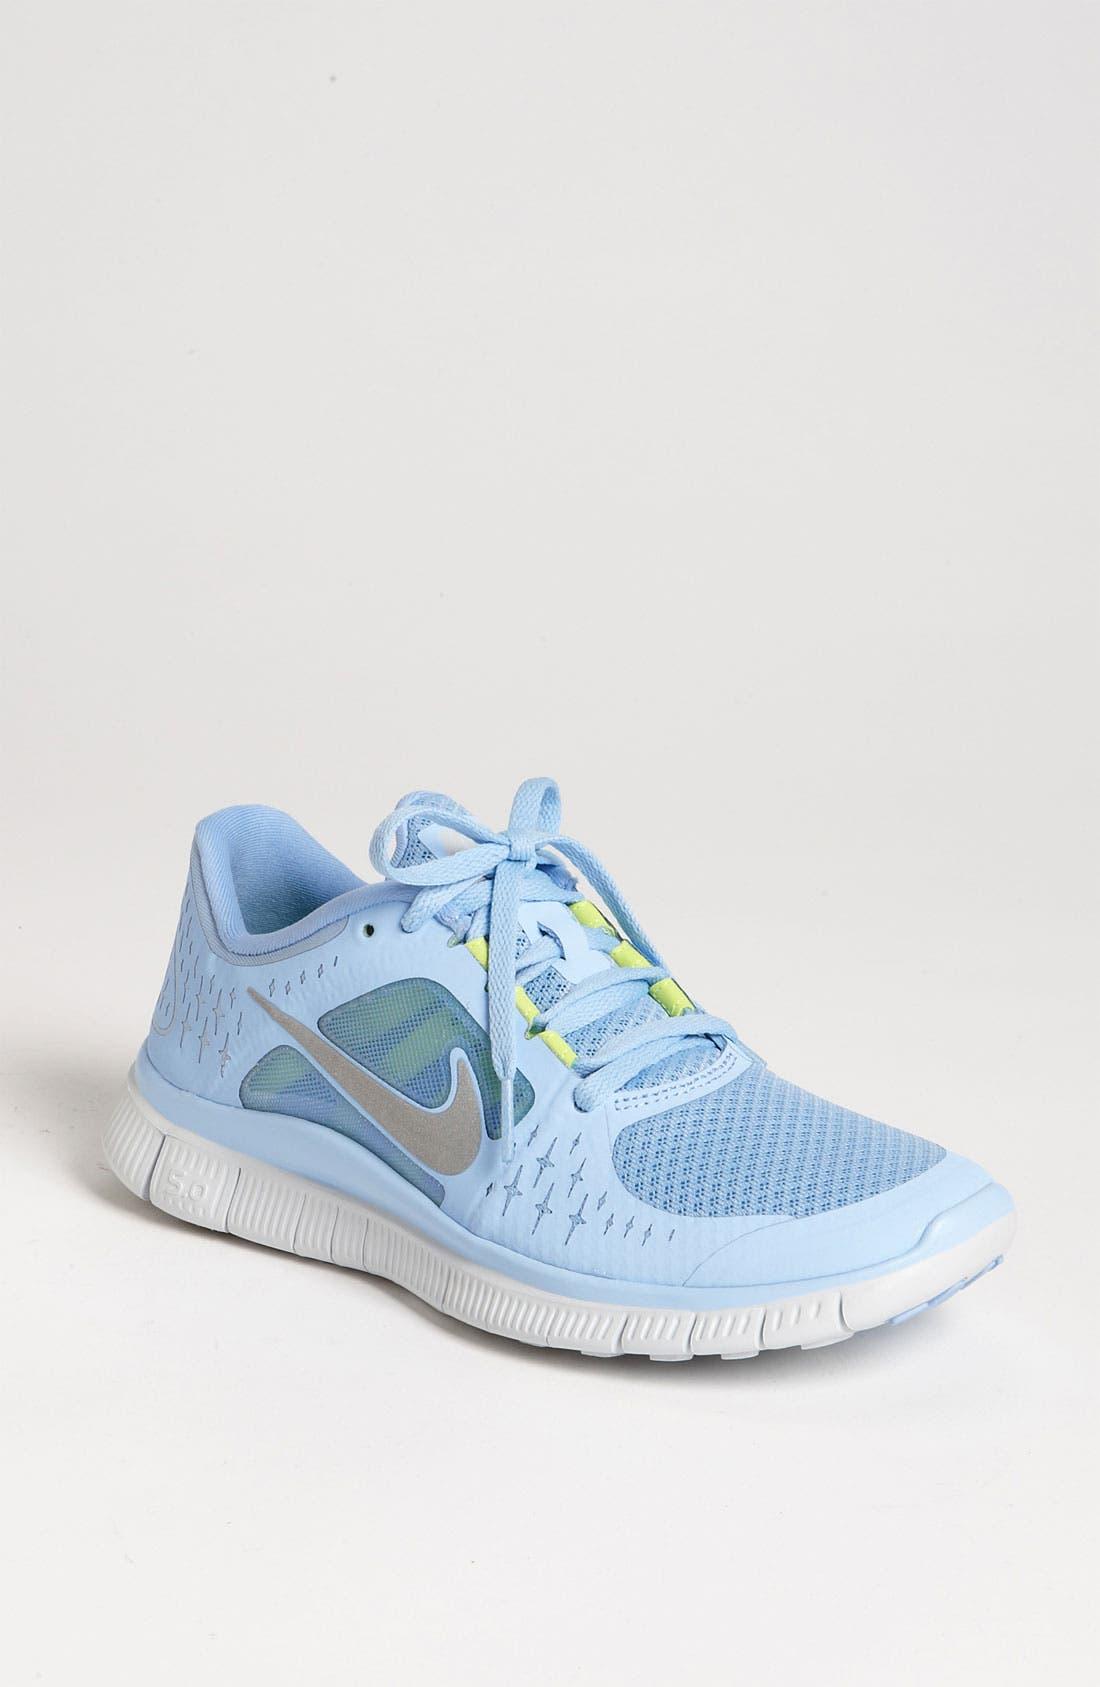 Main Image - Nike 'Free Run+ 3' Running Shoe (Women)